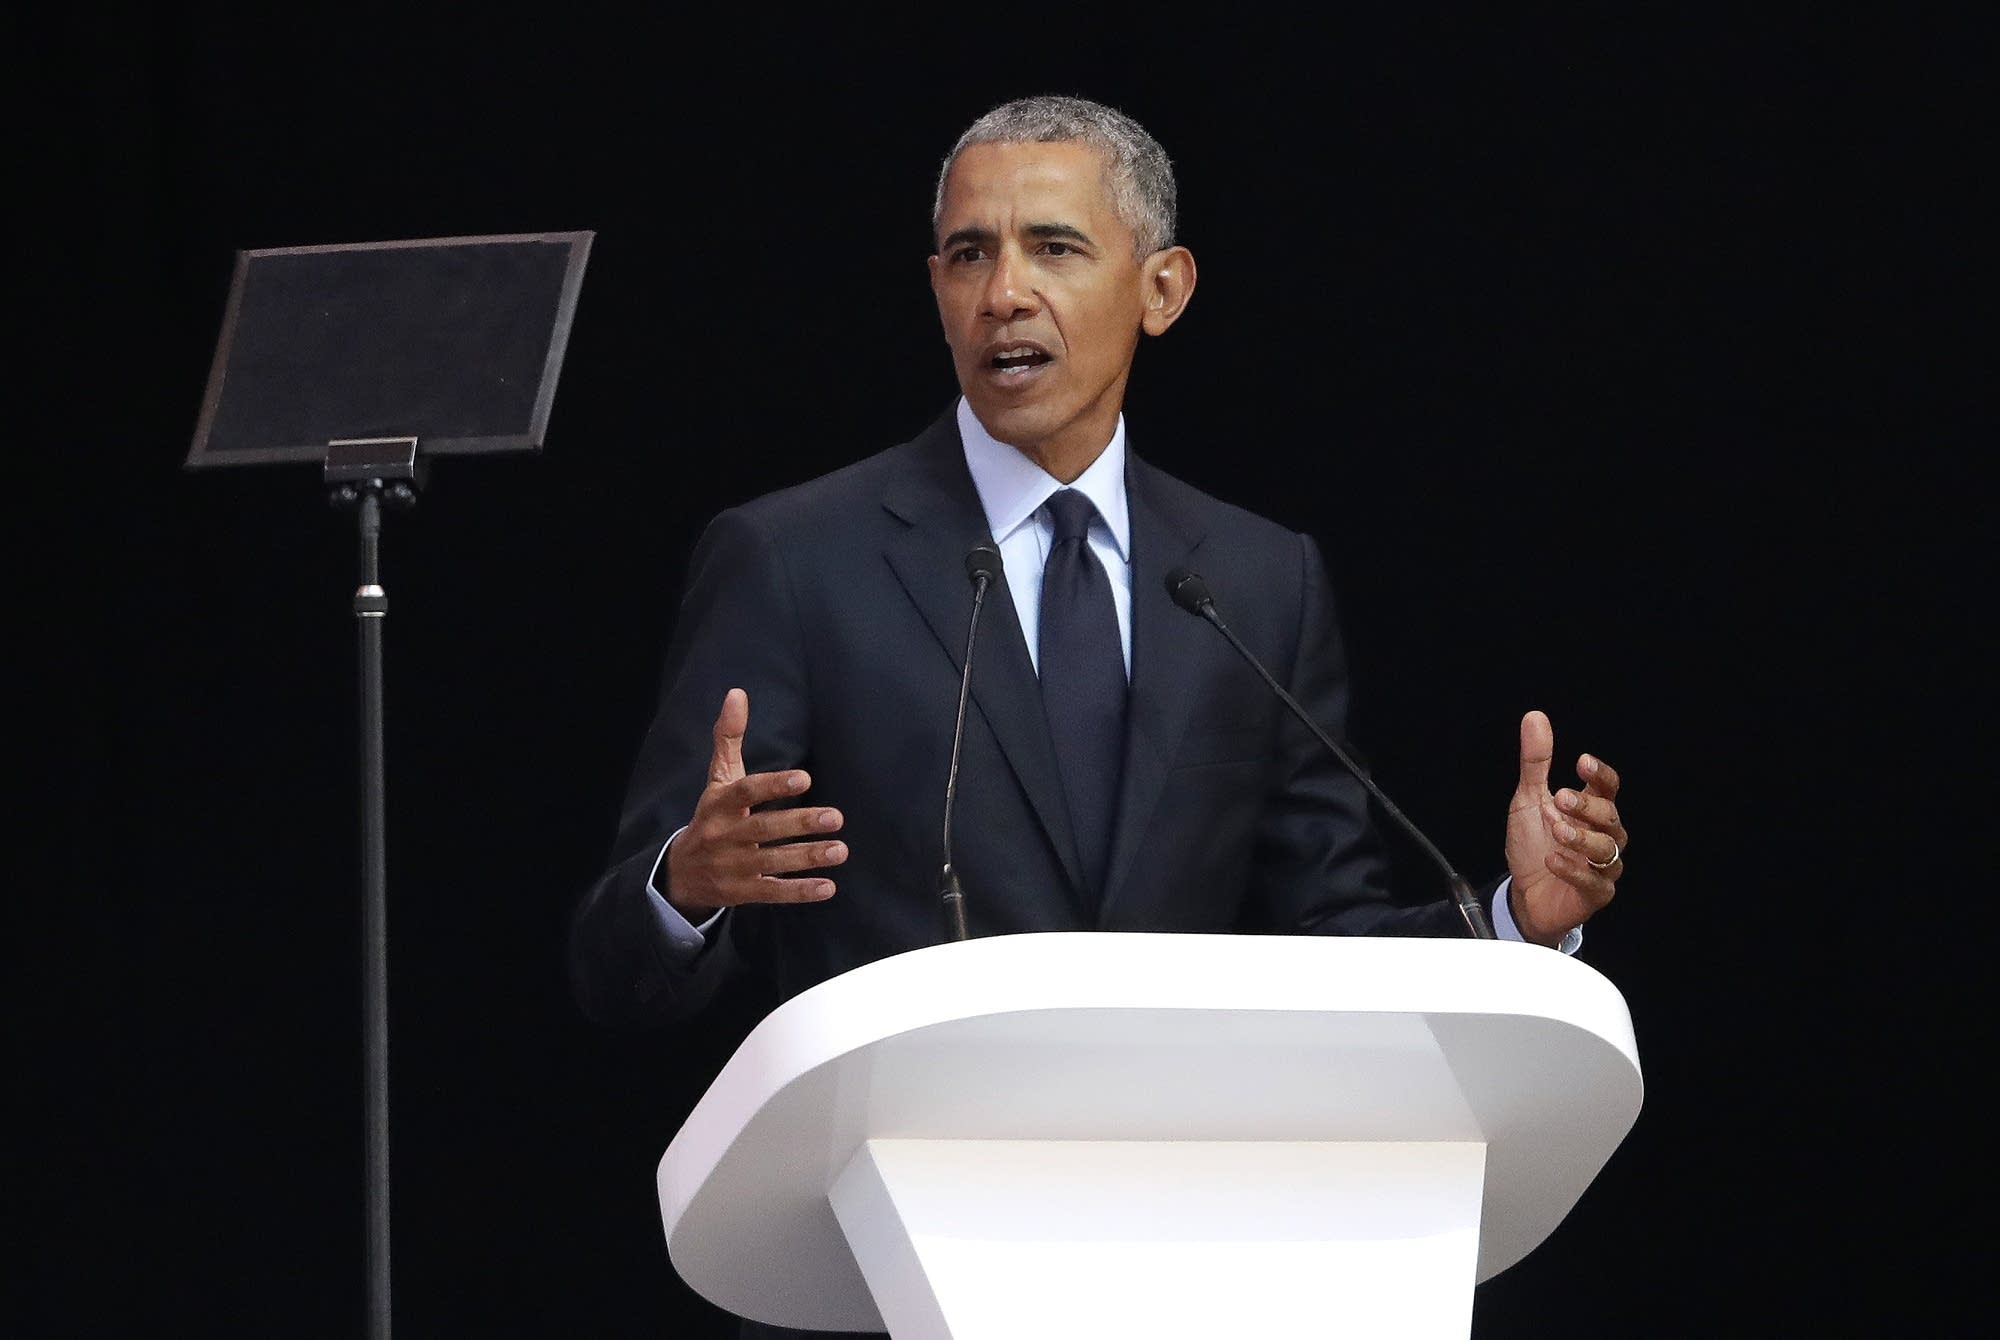 Afrique du Sud: Barack Obama tacle Donald Trump dans son hommage à Mandela